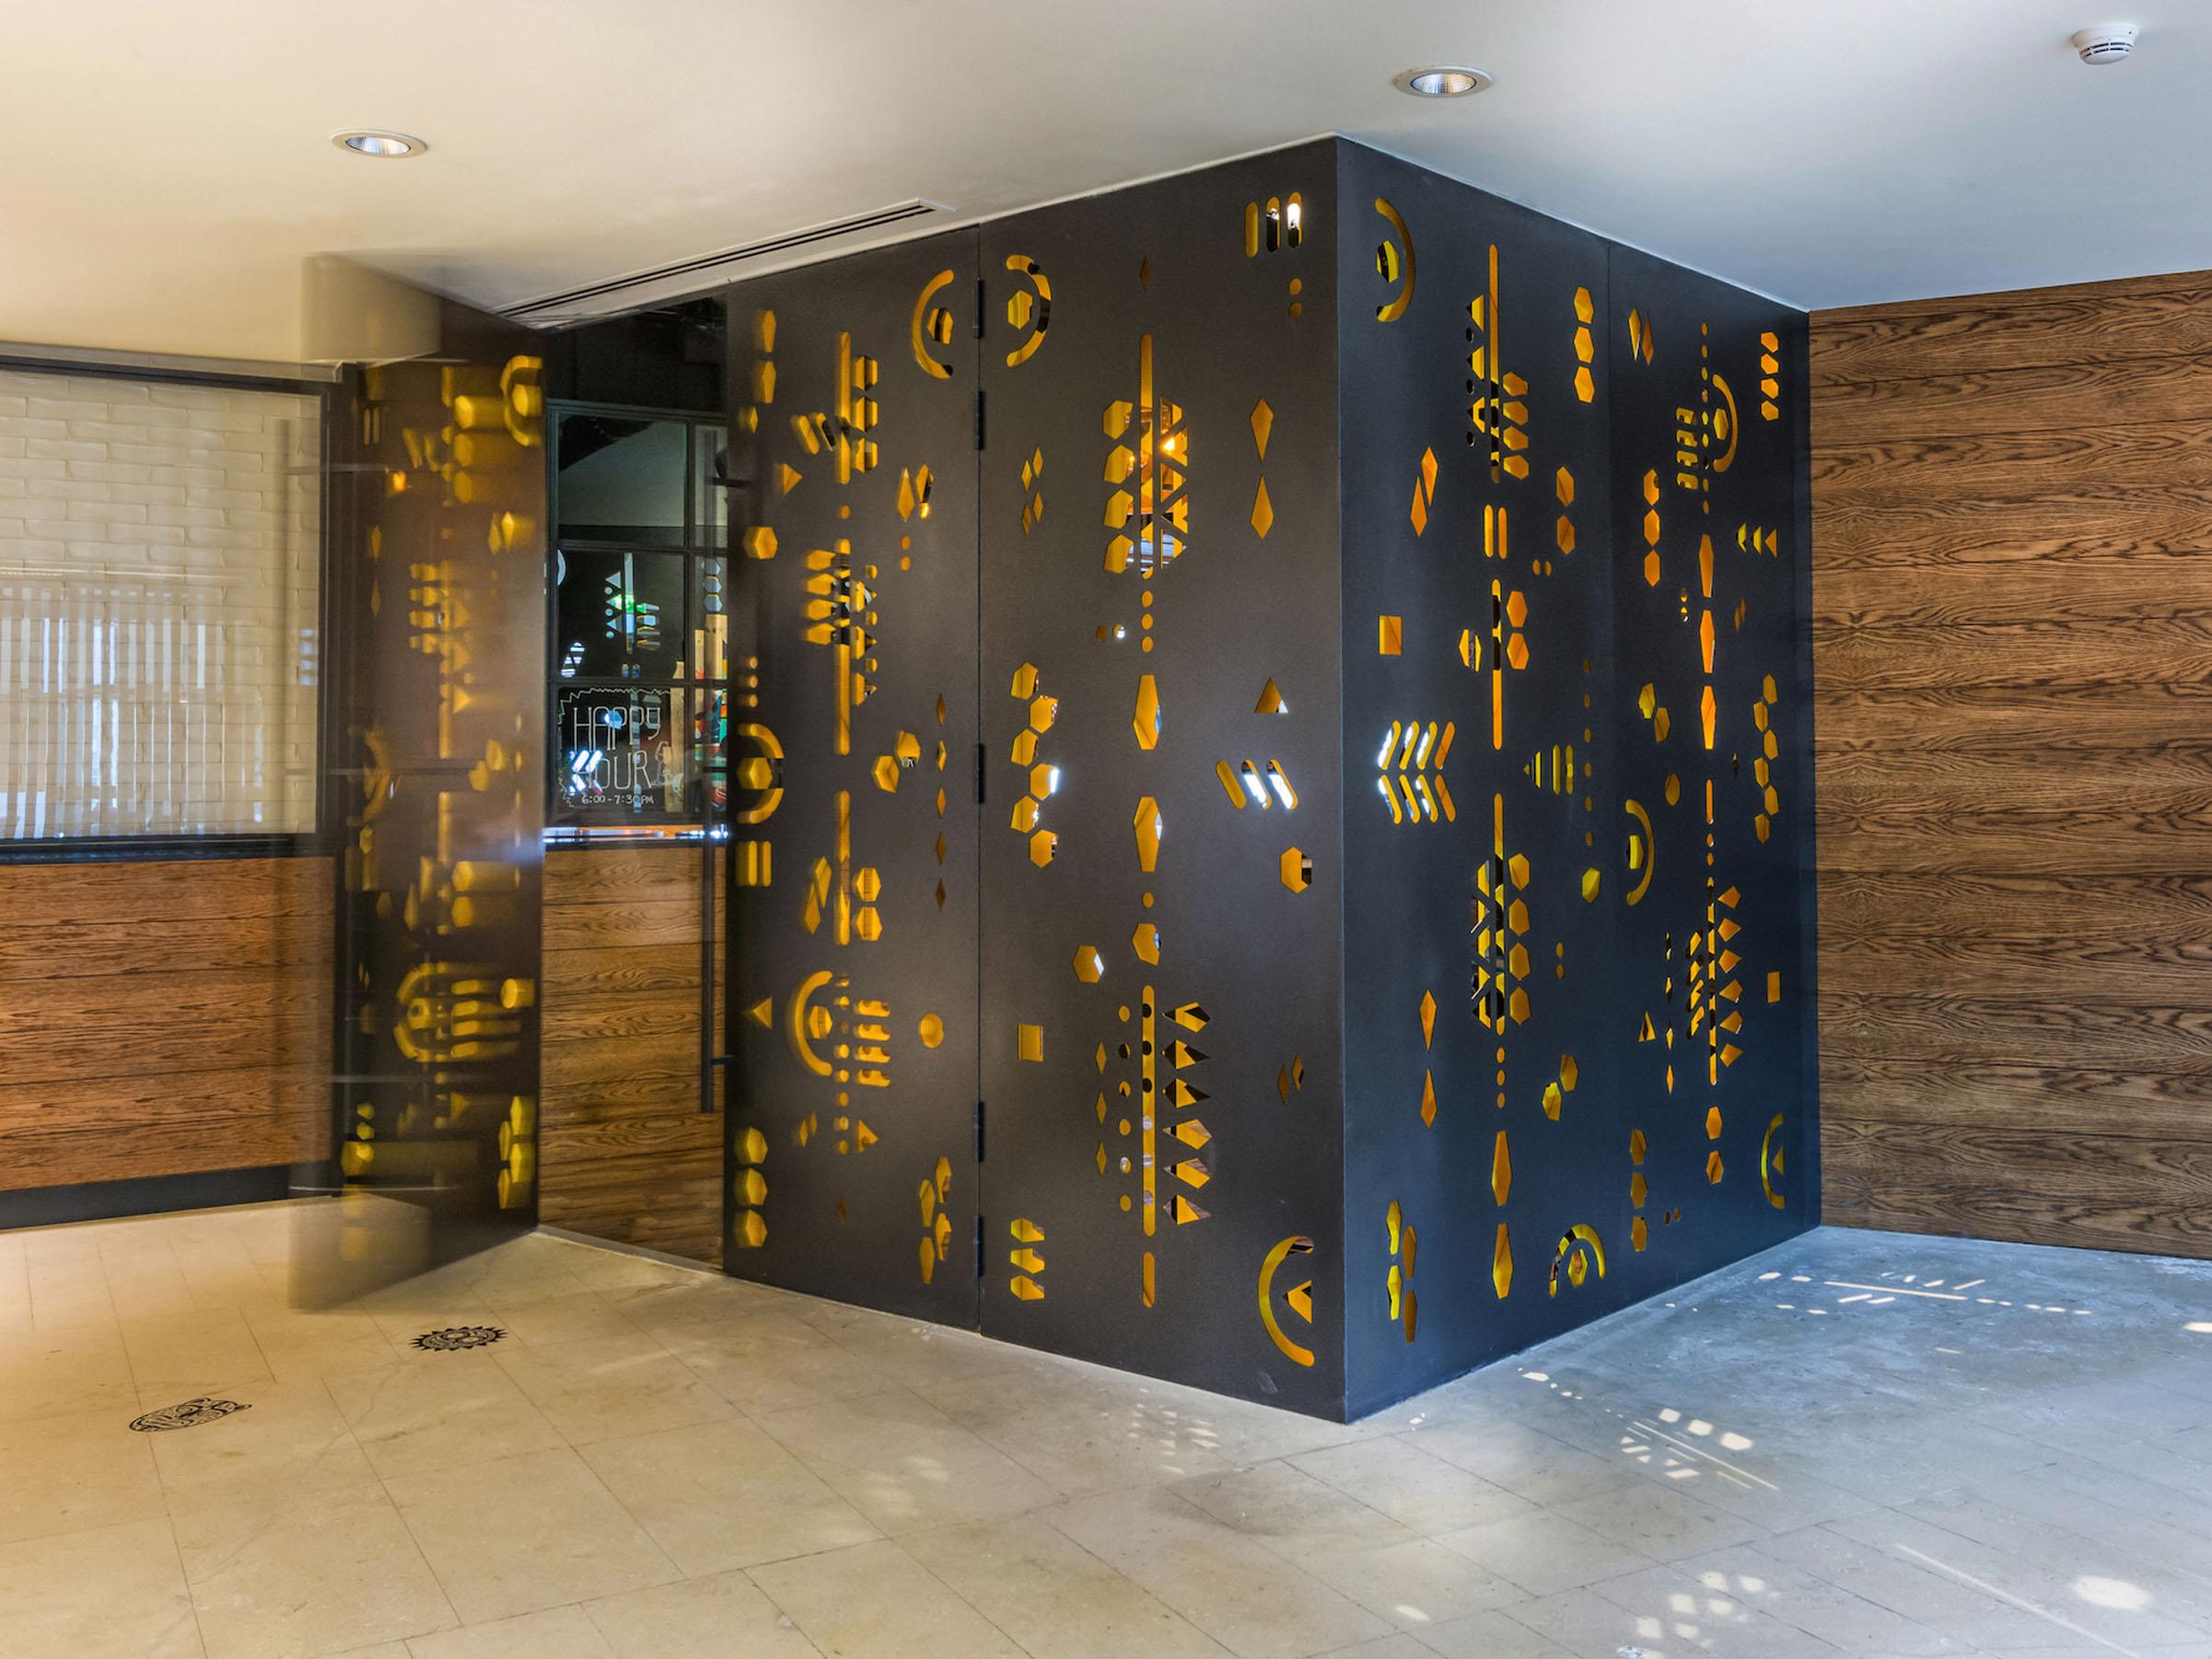 03-capsule-arts-projects-tablita-entrance.jpg